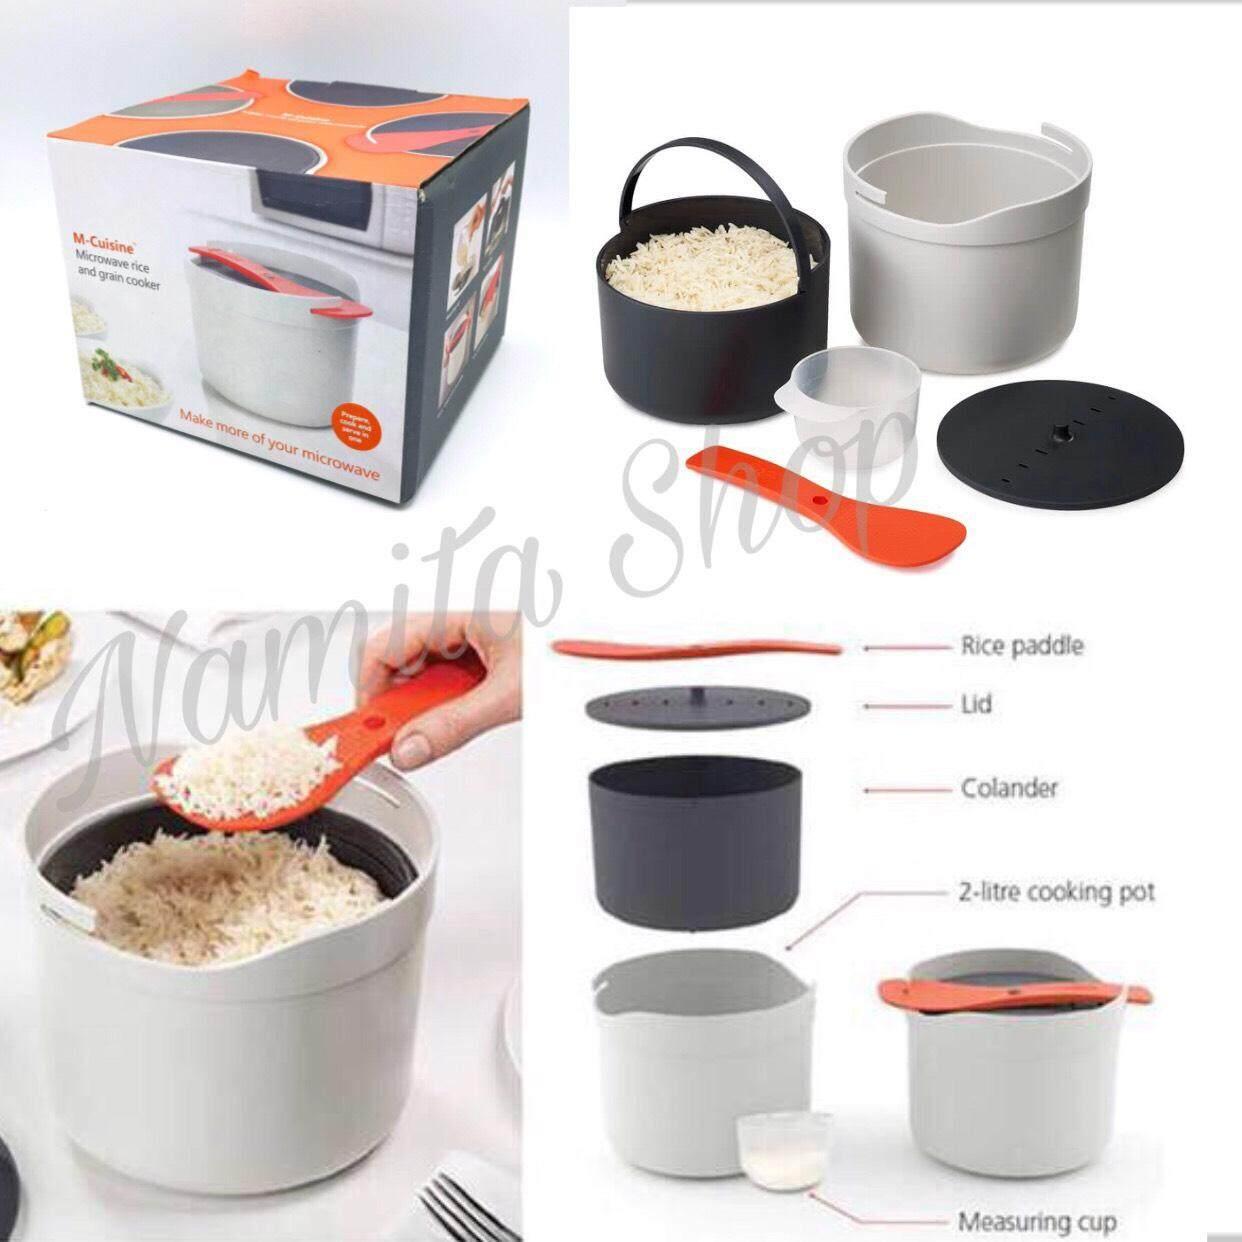 M-Cuisine Rice Cooker Microwave หม้อหุงข้าวสำหรับเข้าไมโครเวฟ หุงข้าวด้วยไมโครเวฟ (จัดส่งฟรี!!!)